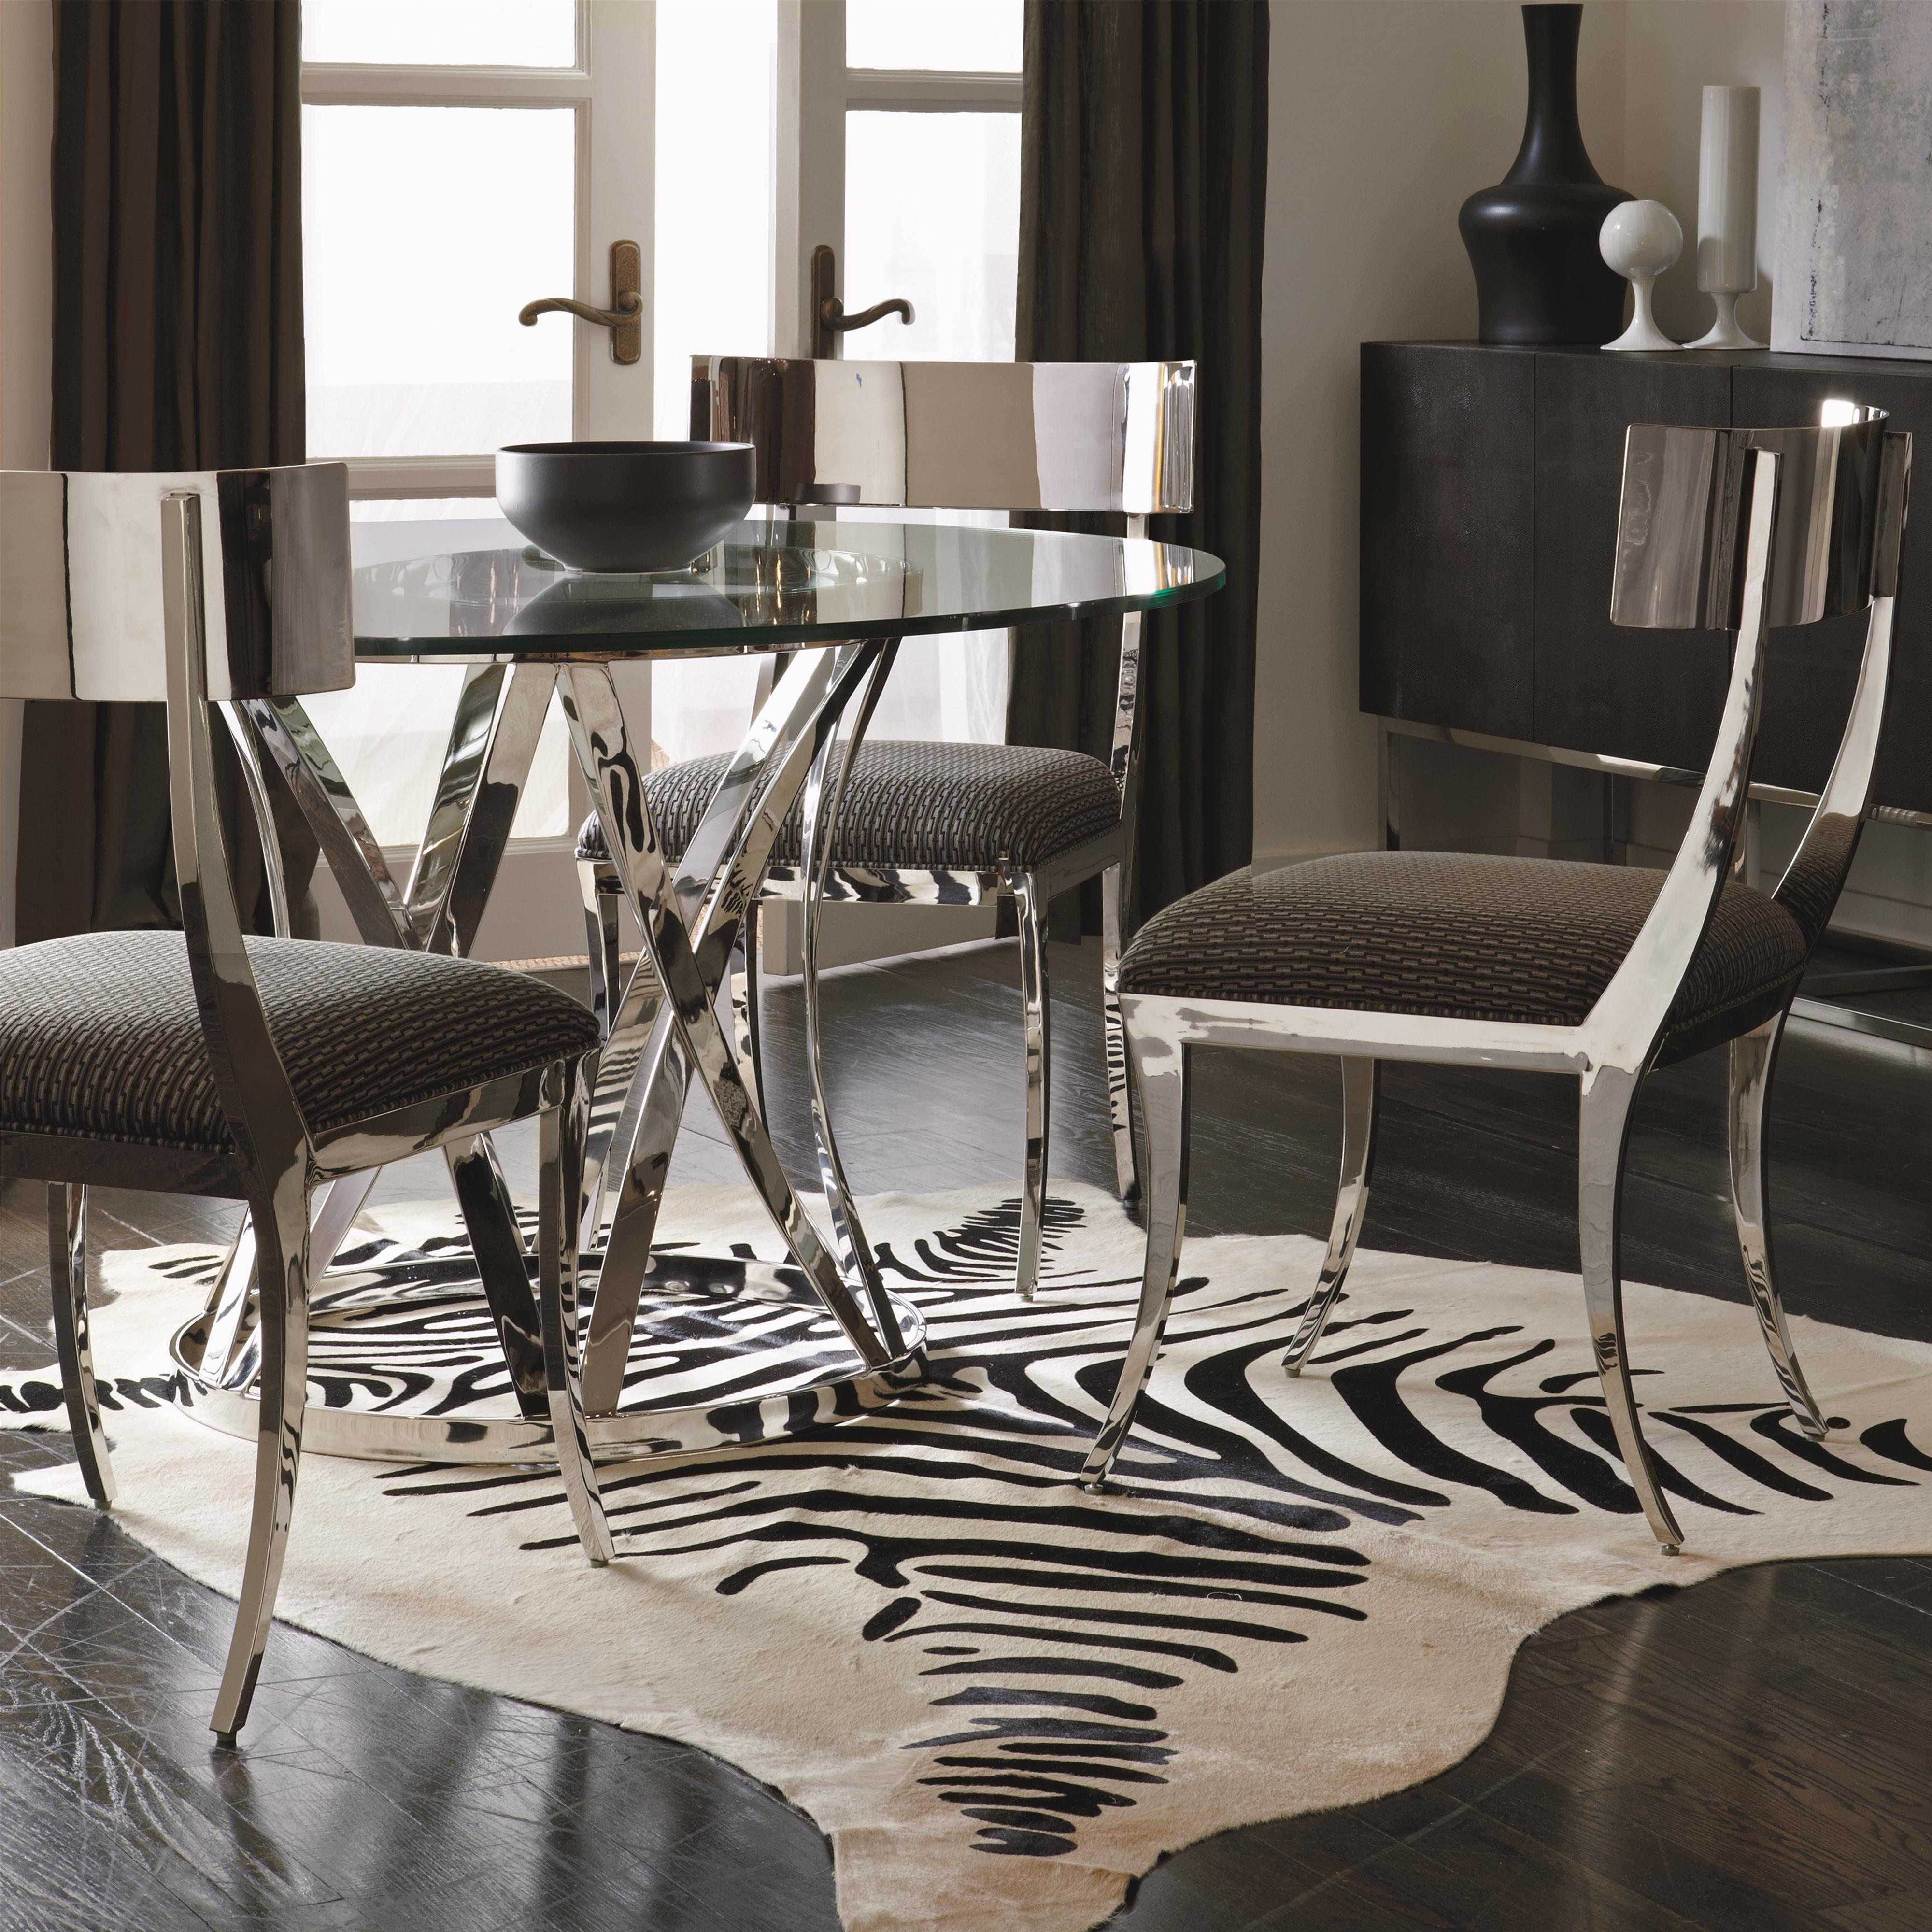 Interiors Gustav 4 Piece Contemporary Dining Table And Chair Set By Bernhardt At Baer S Furniture Ev Ic Mekanlari Ev Icin Mobilya